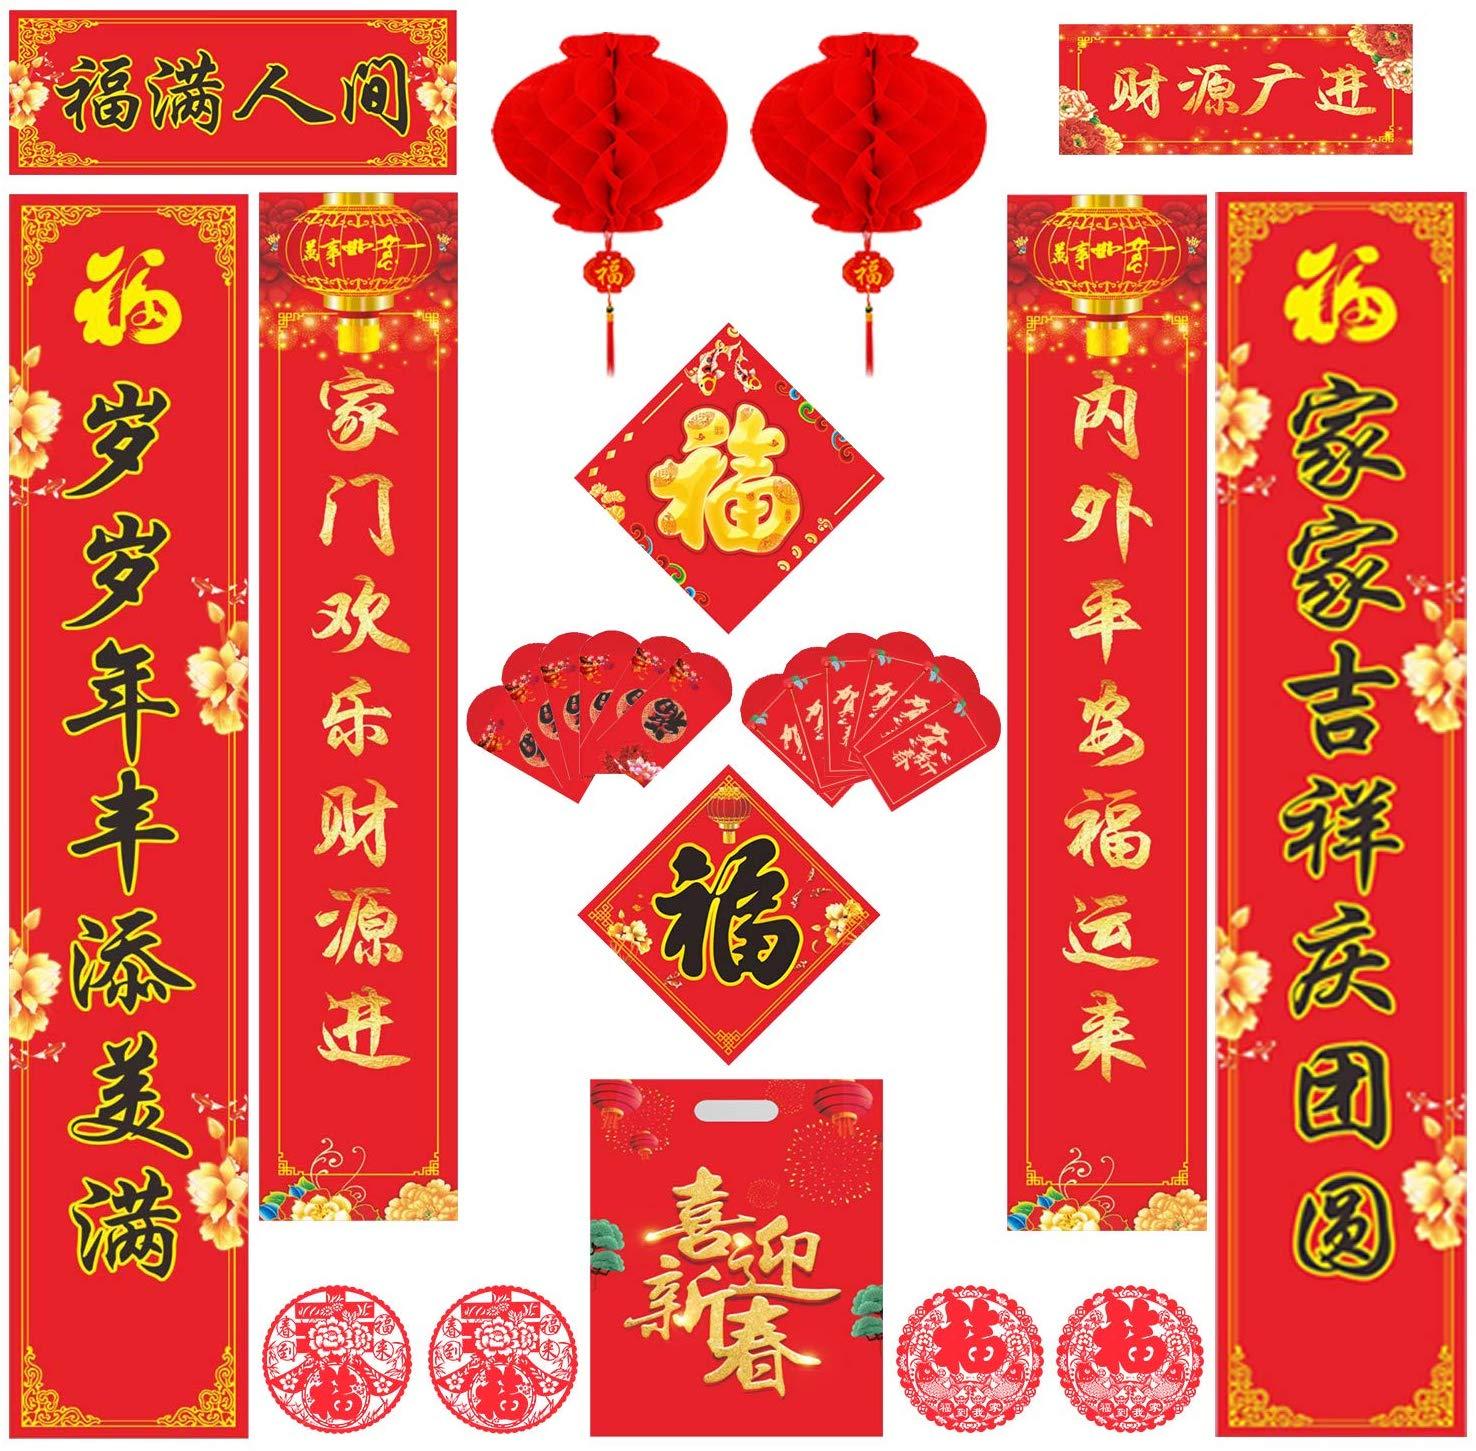 Amazoncom SHIYIXING 26PCS Chinese New Year Decorations 2020 1476x1451